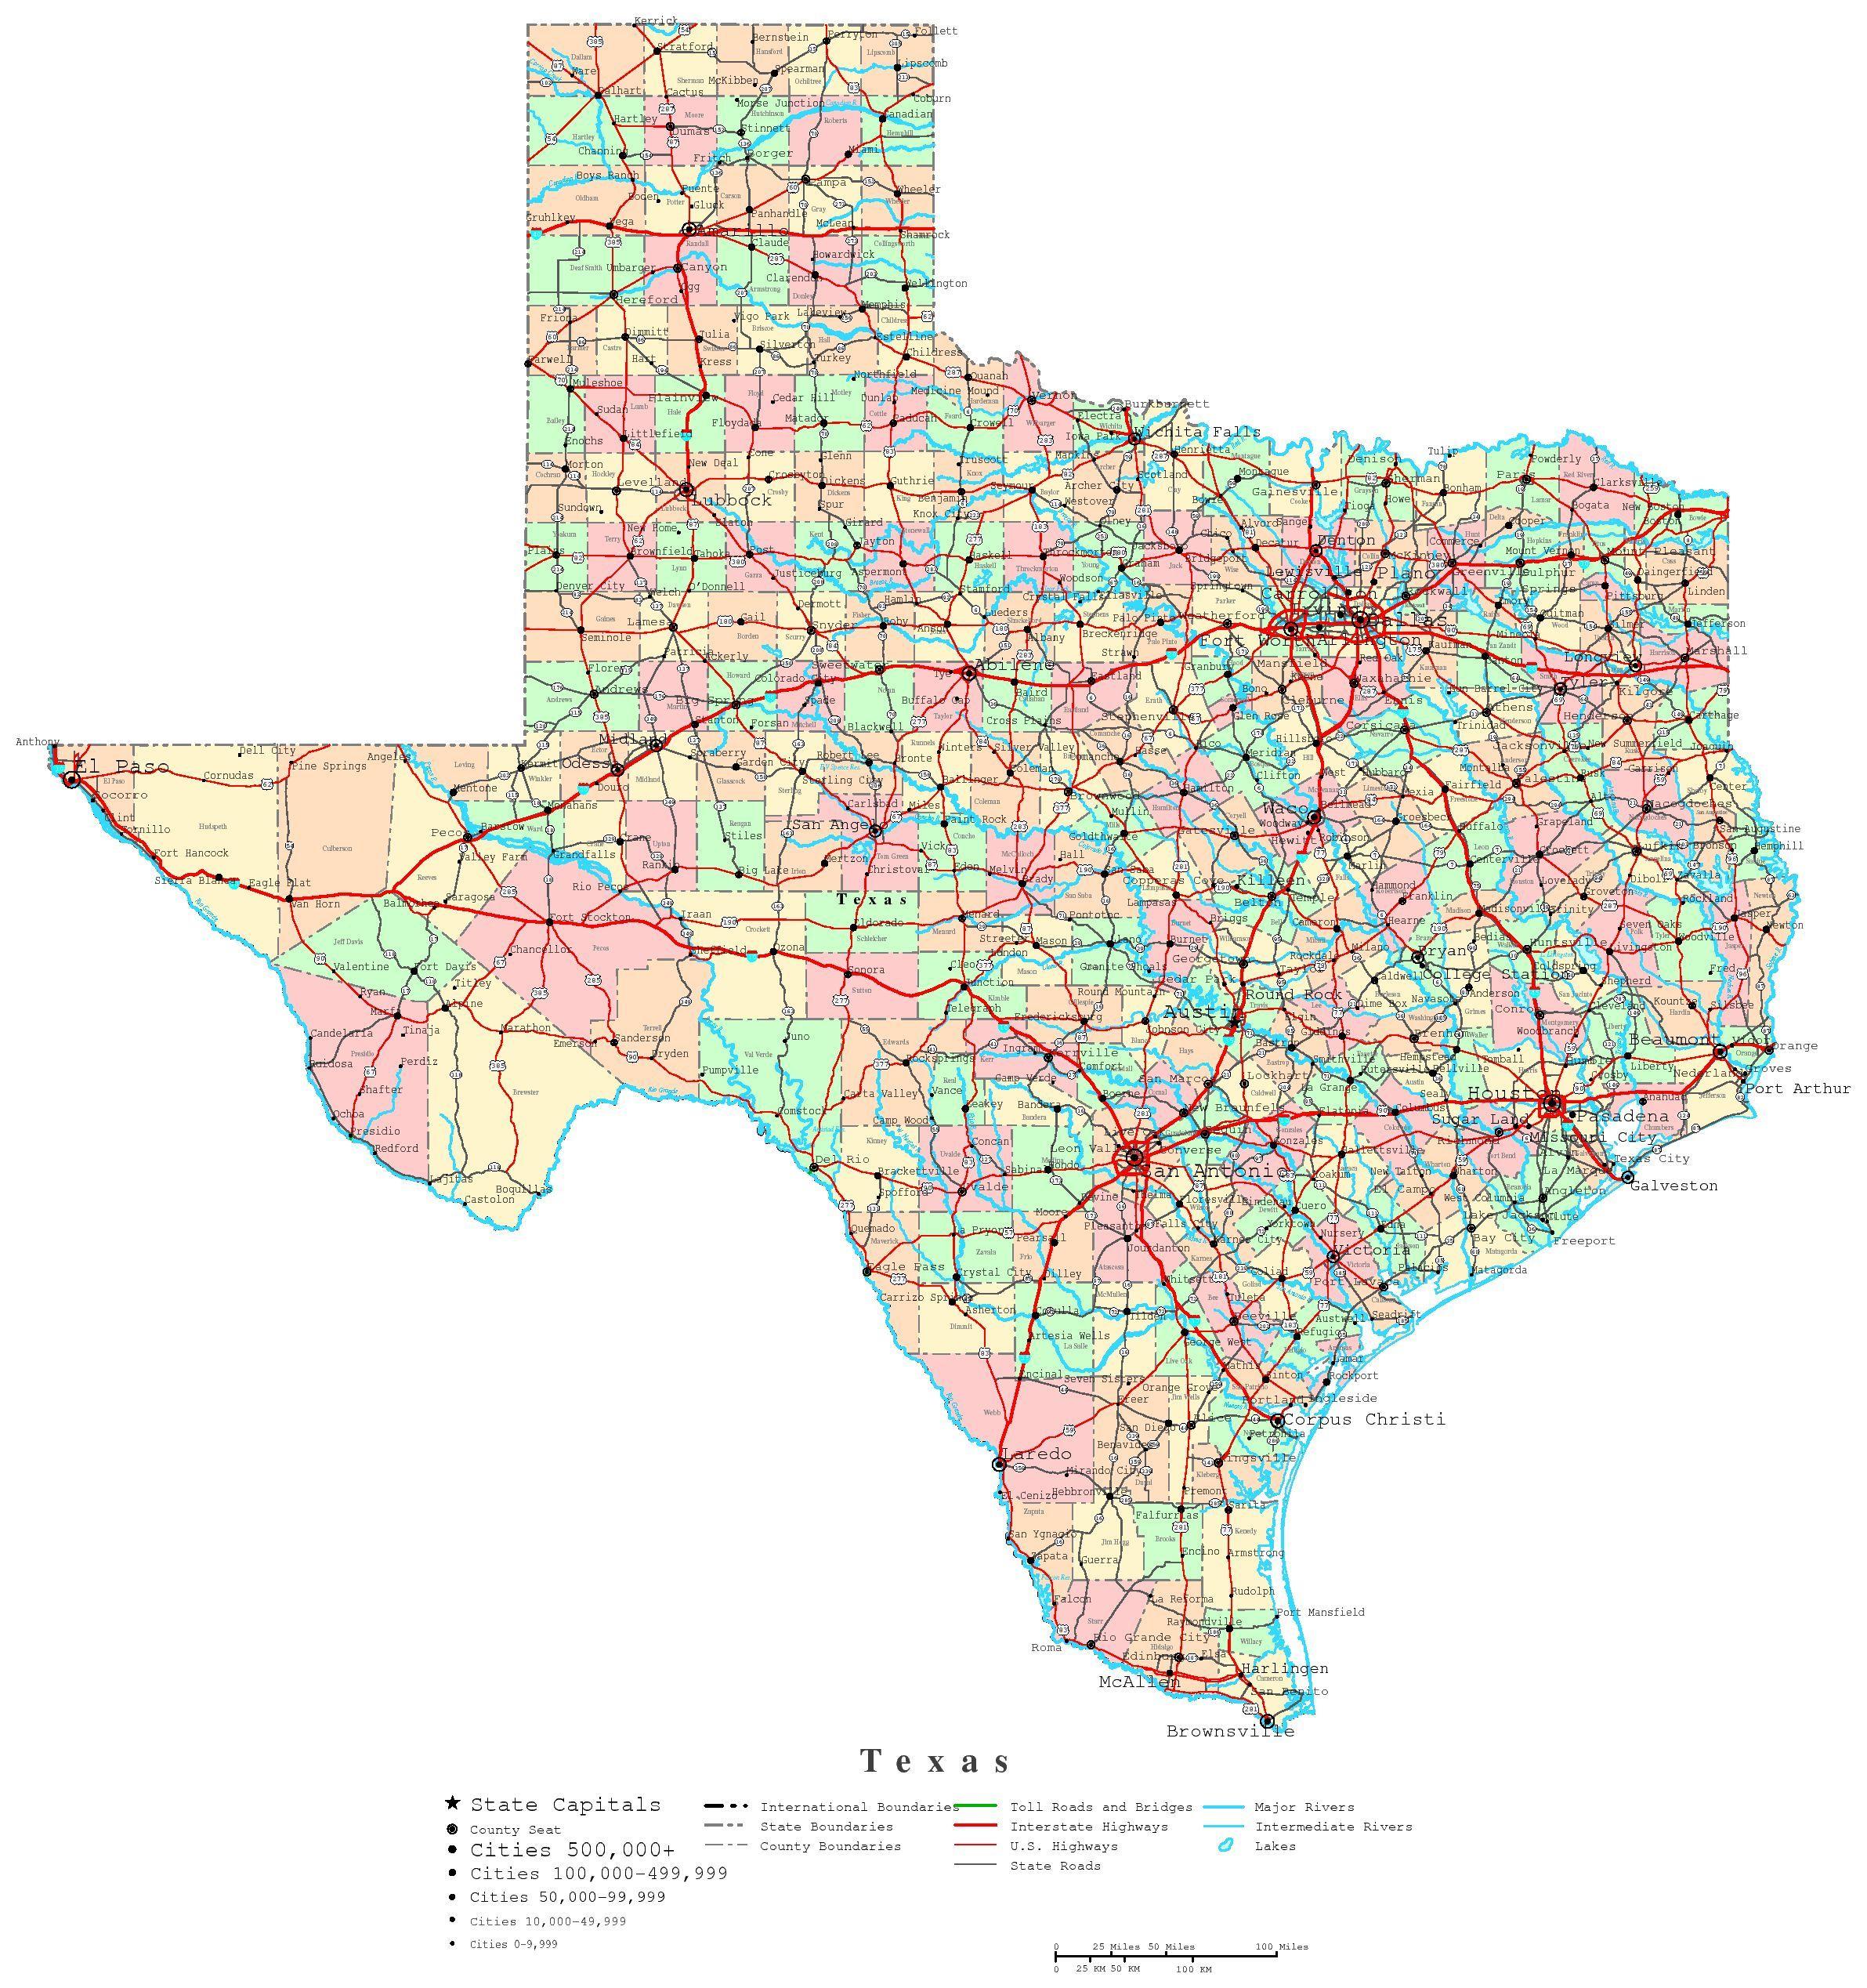 Printable Map Of Texas | Useful Info | Pinterest | Printable Maps - Texas Road Map Free